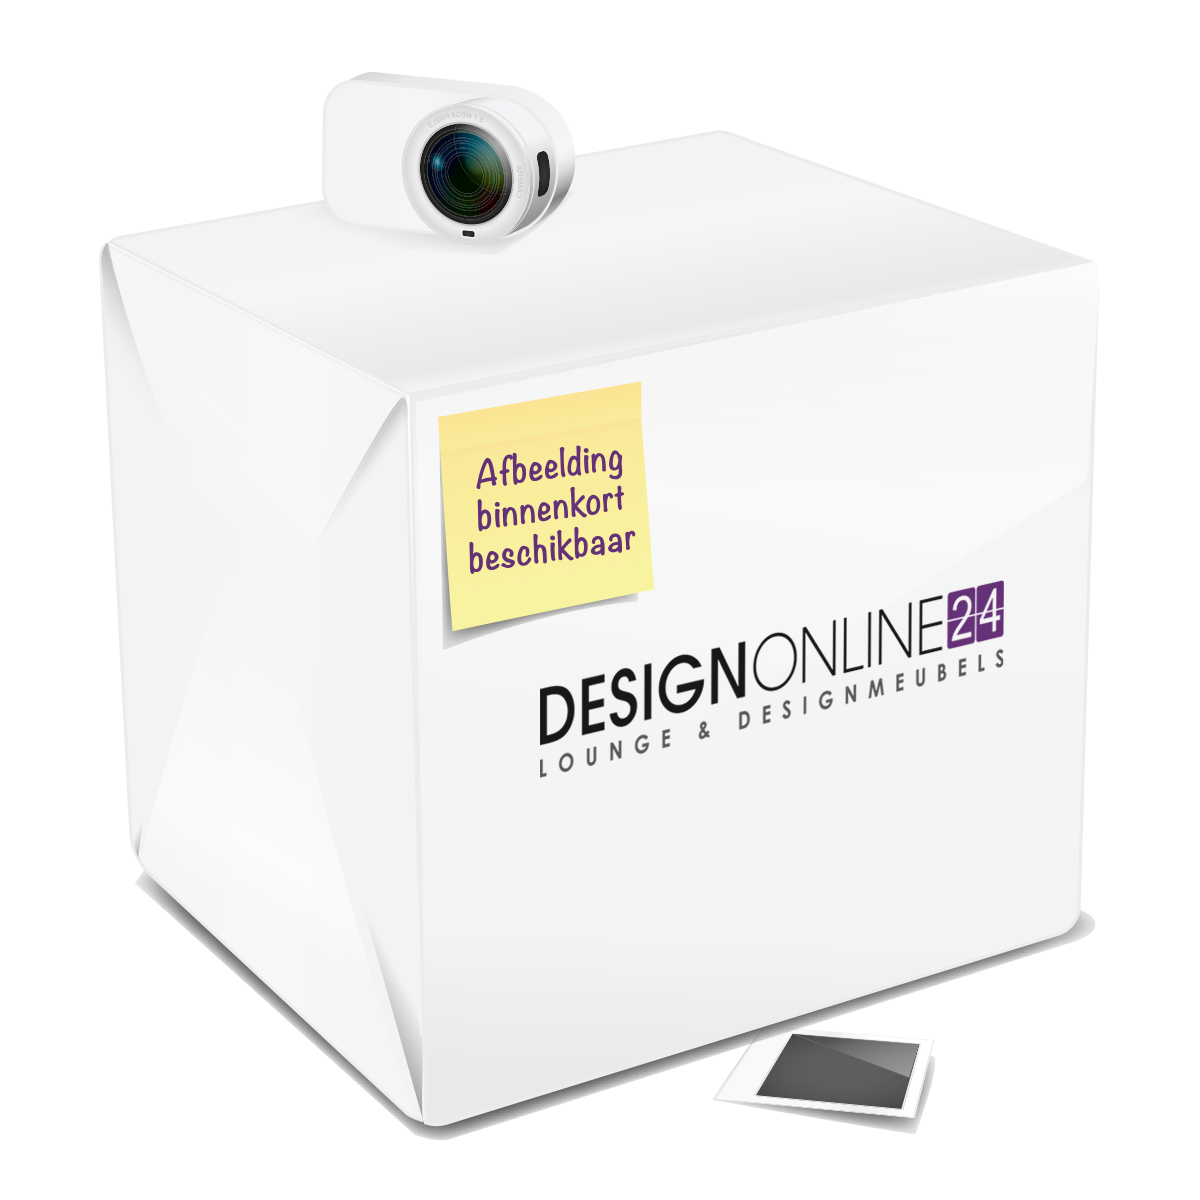 Armony - 4 Stoelen wit kunstleer - LaForma - DesignOnline24